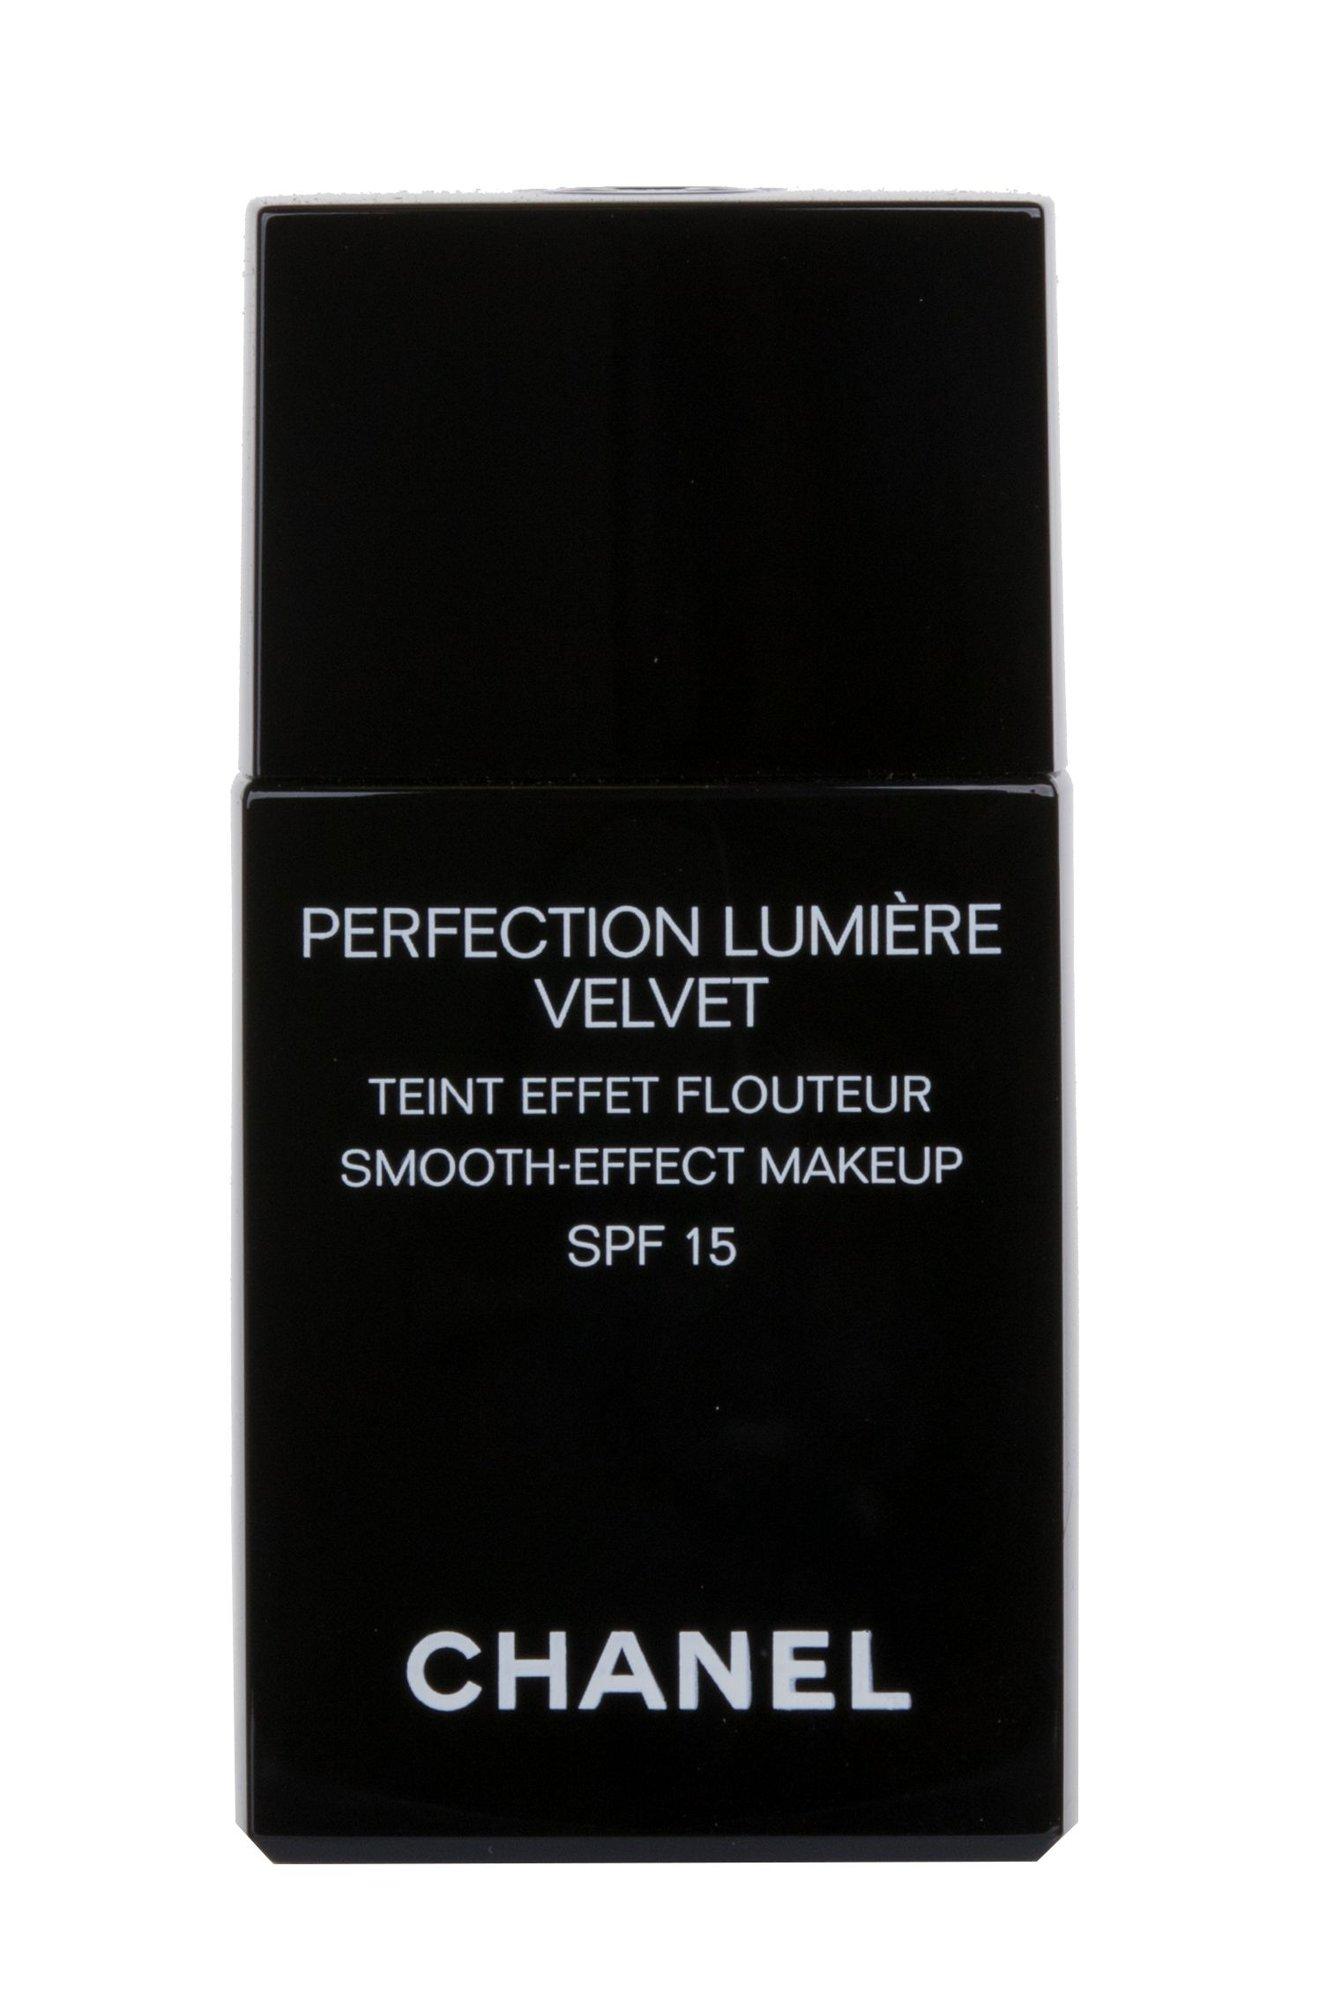 Chanel Perfection Lumiére Cosmetic 30ml 10 Beige Velvet